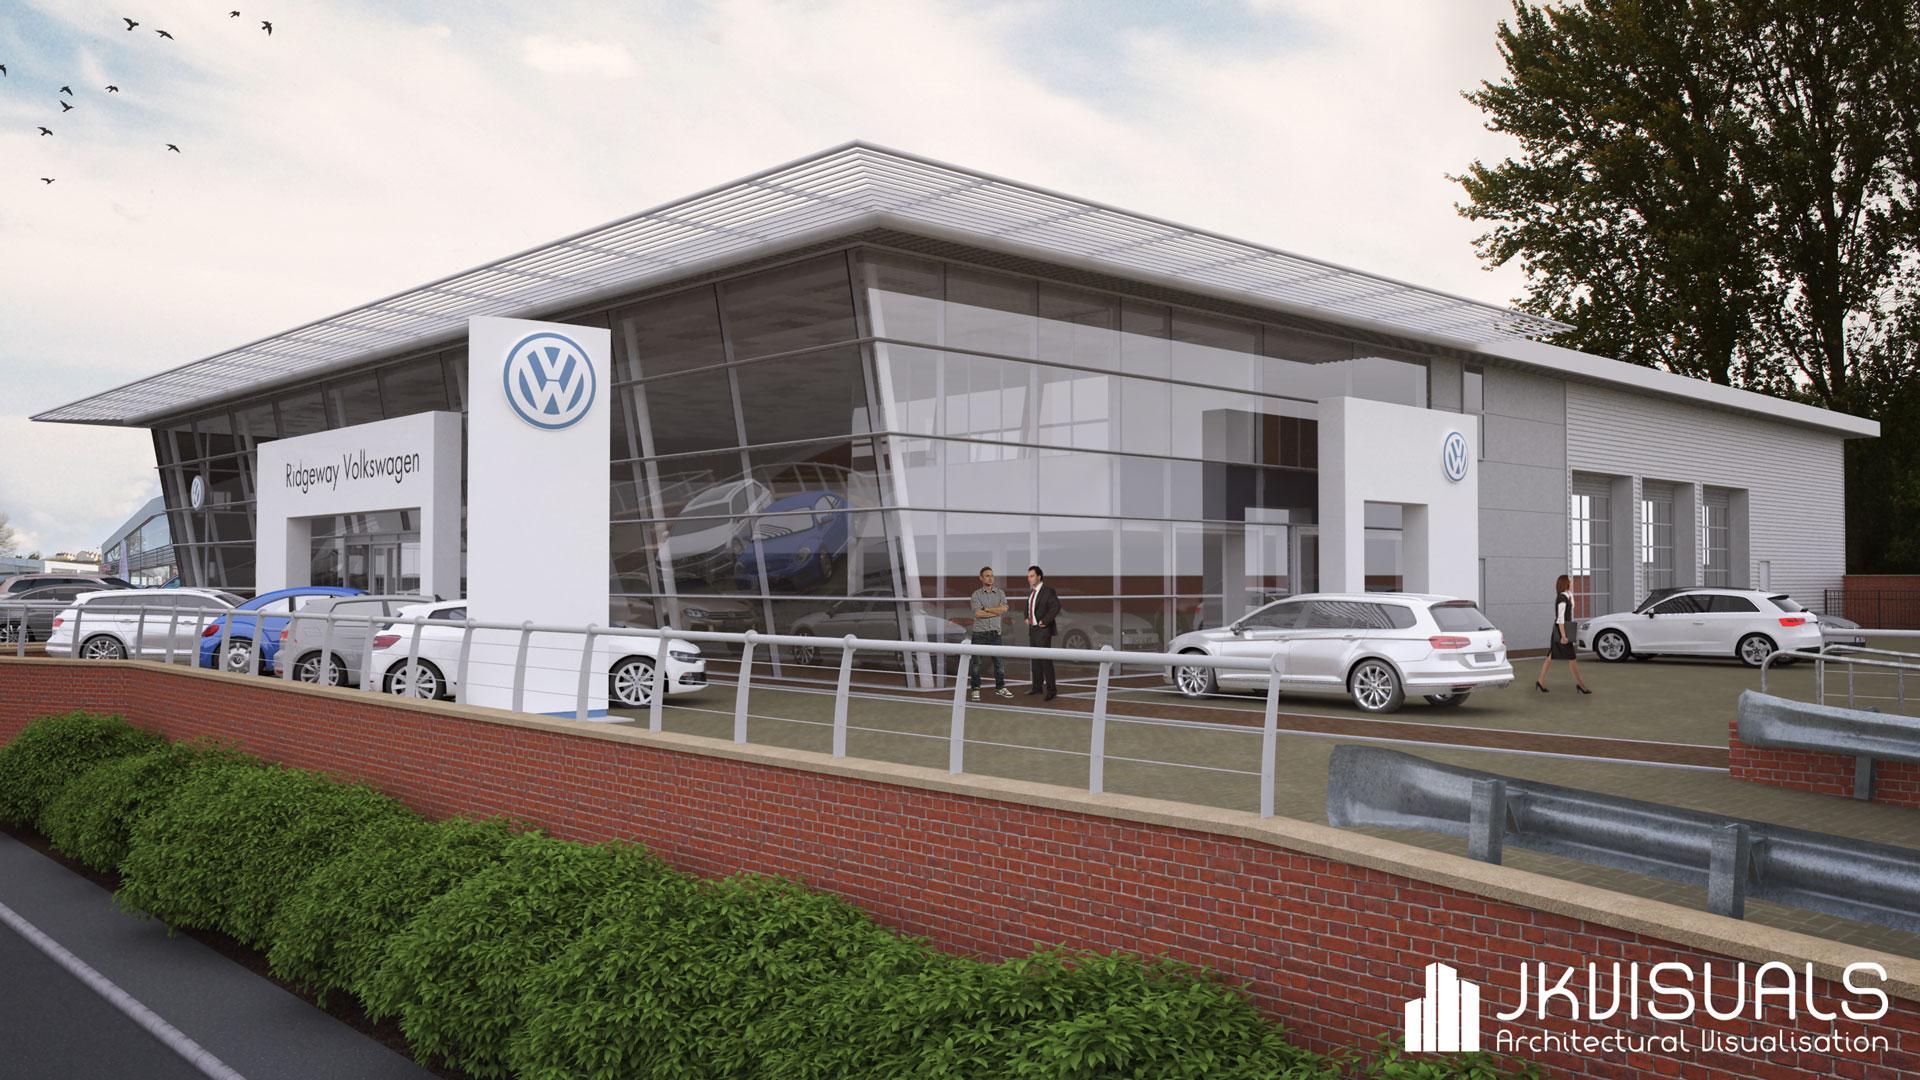 VW_Reading_Ridgeway_v1.1_OP+LOGO